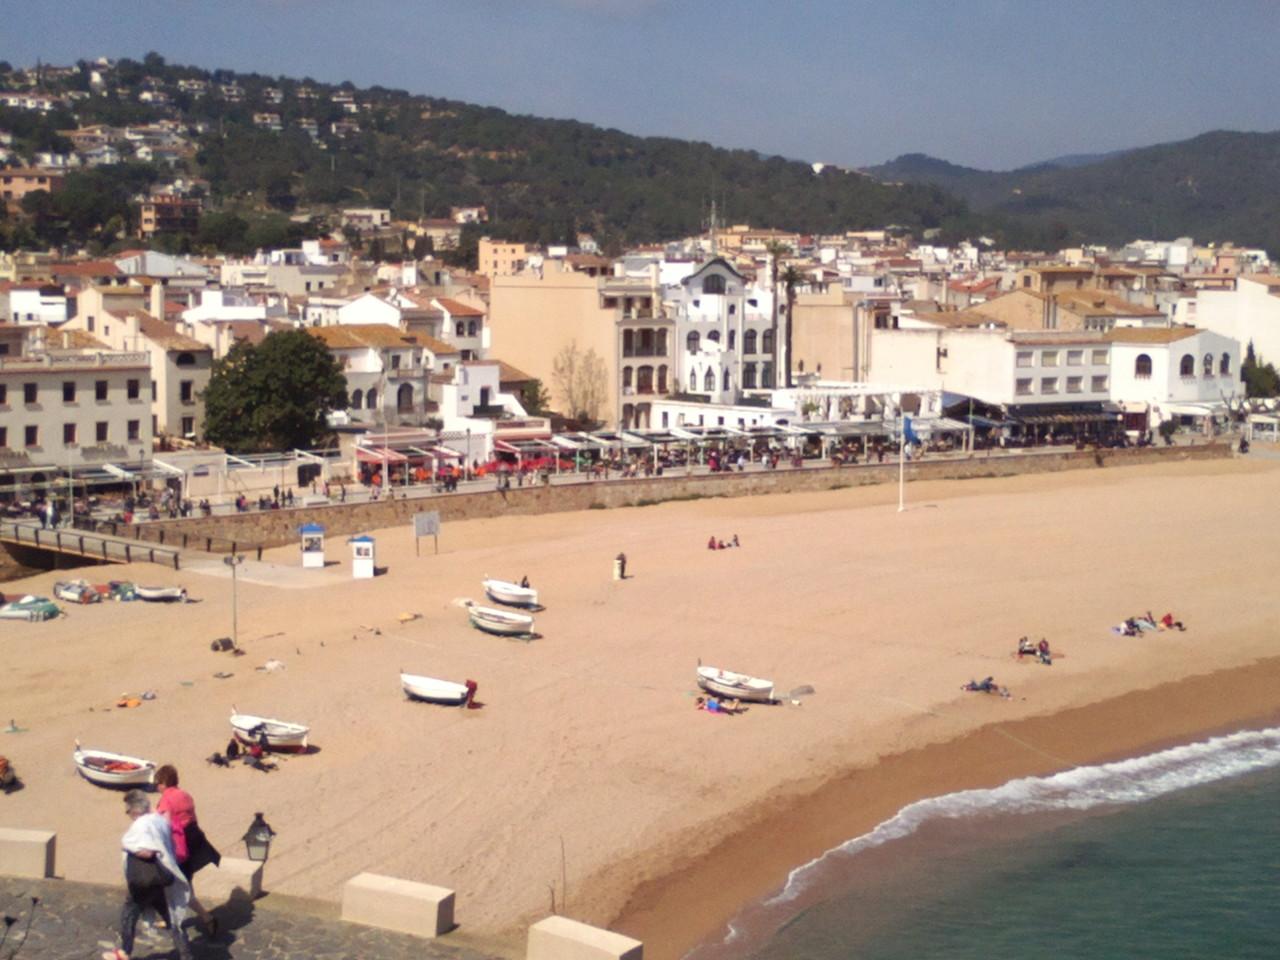 Alquiler de vacaciones en Tossa de Mar, platja gran